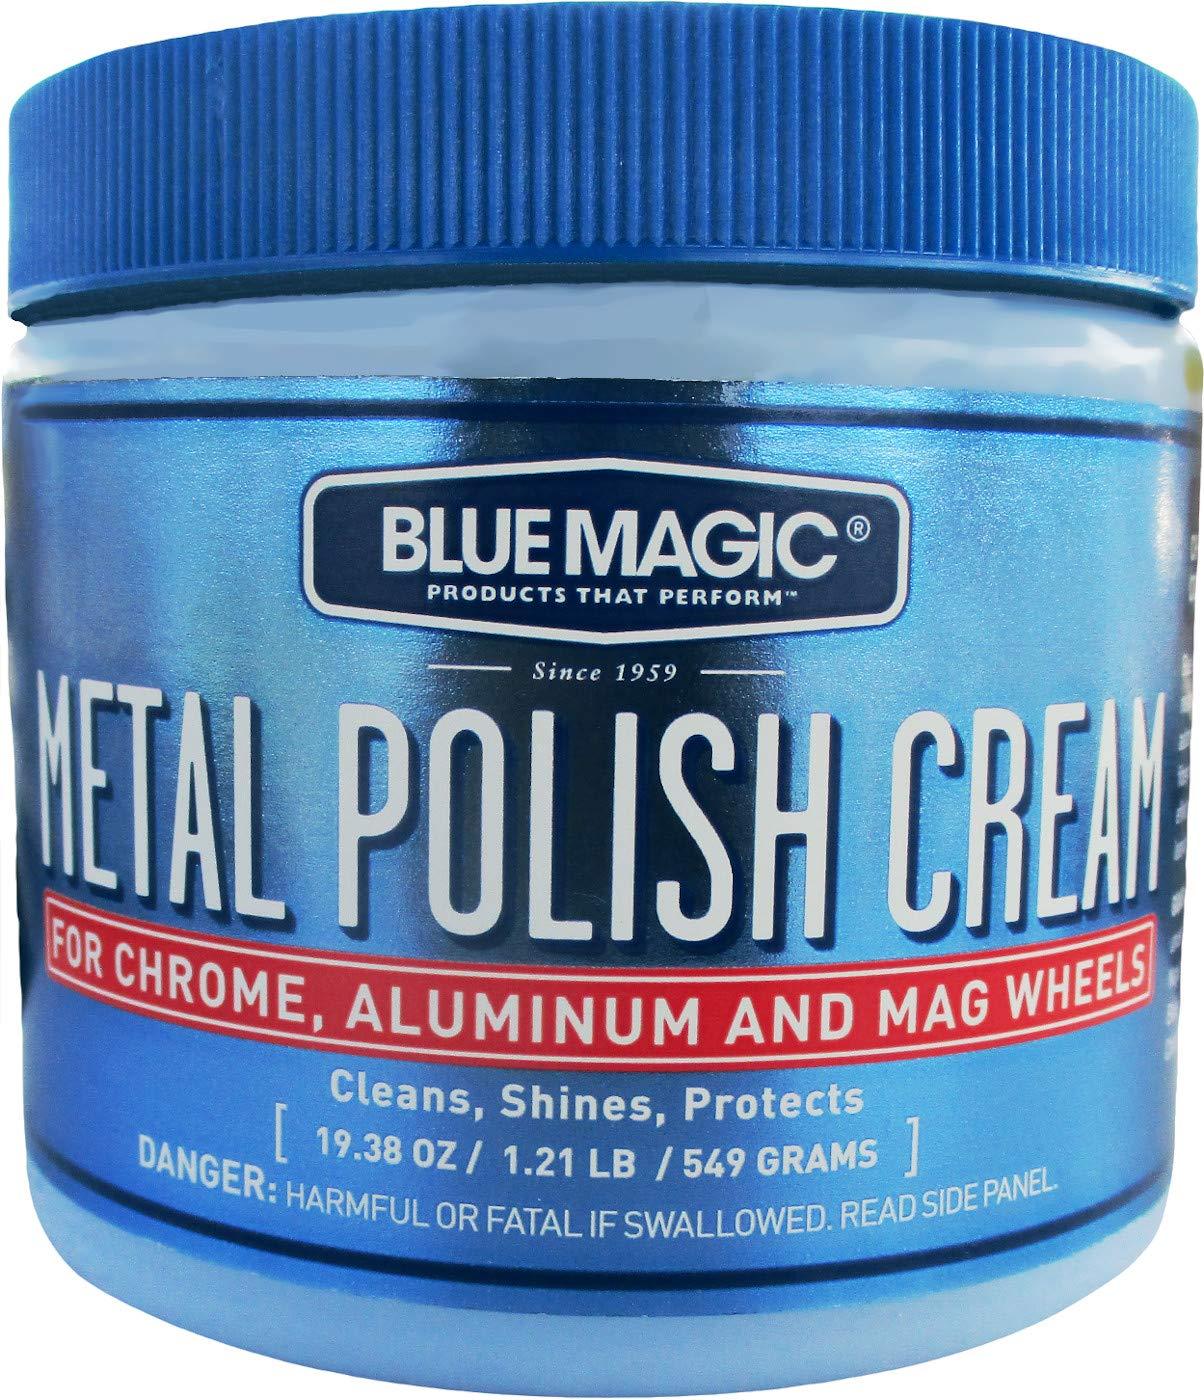 Blue Magic 500-06 Metal Polish Cream - 19 3/8 oz.